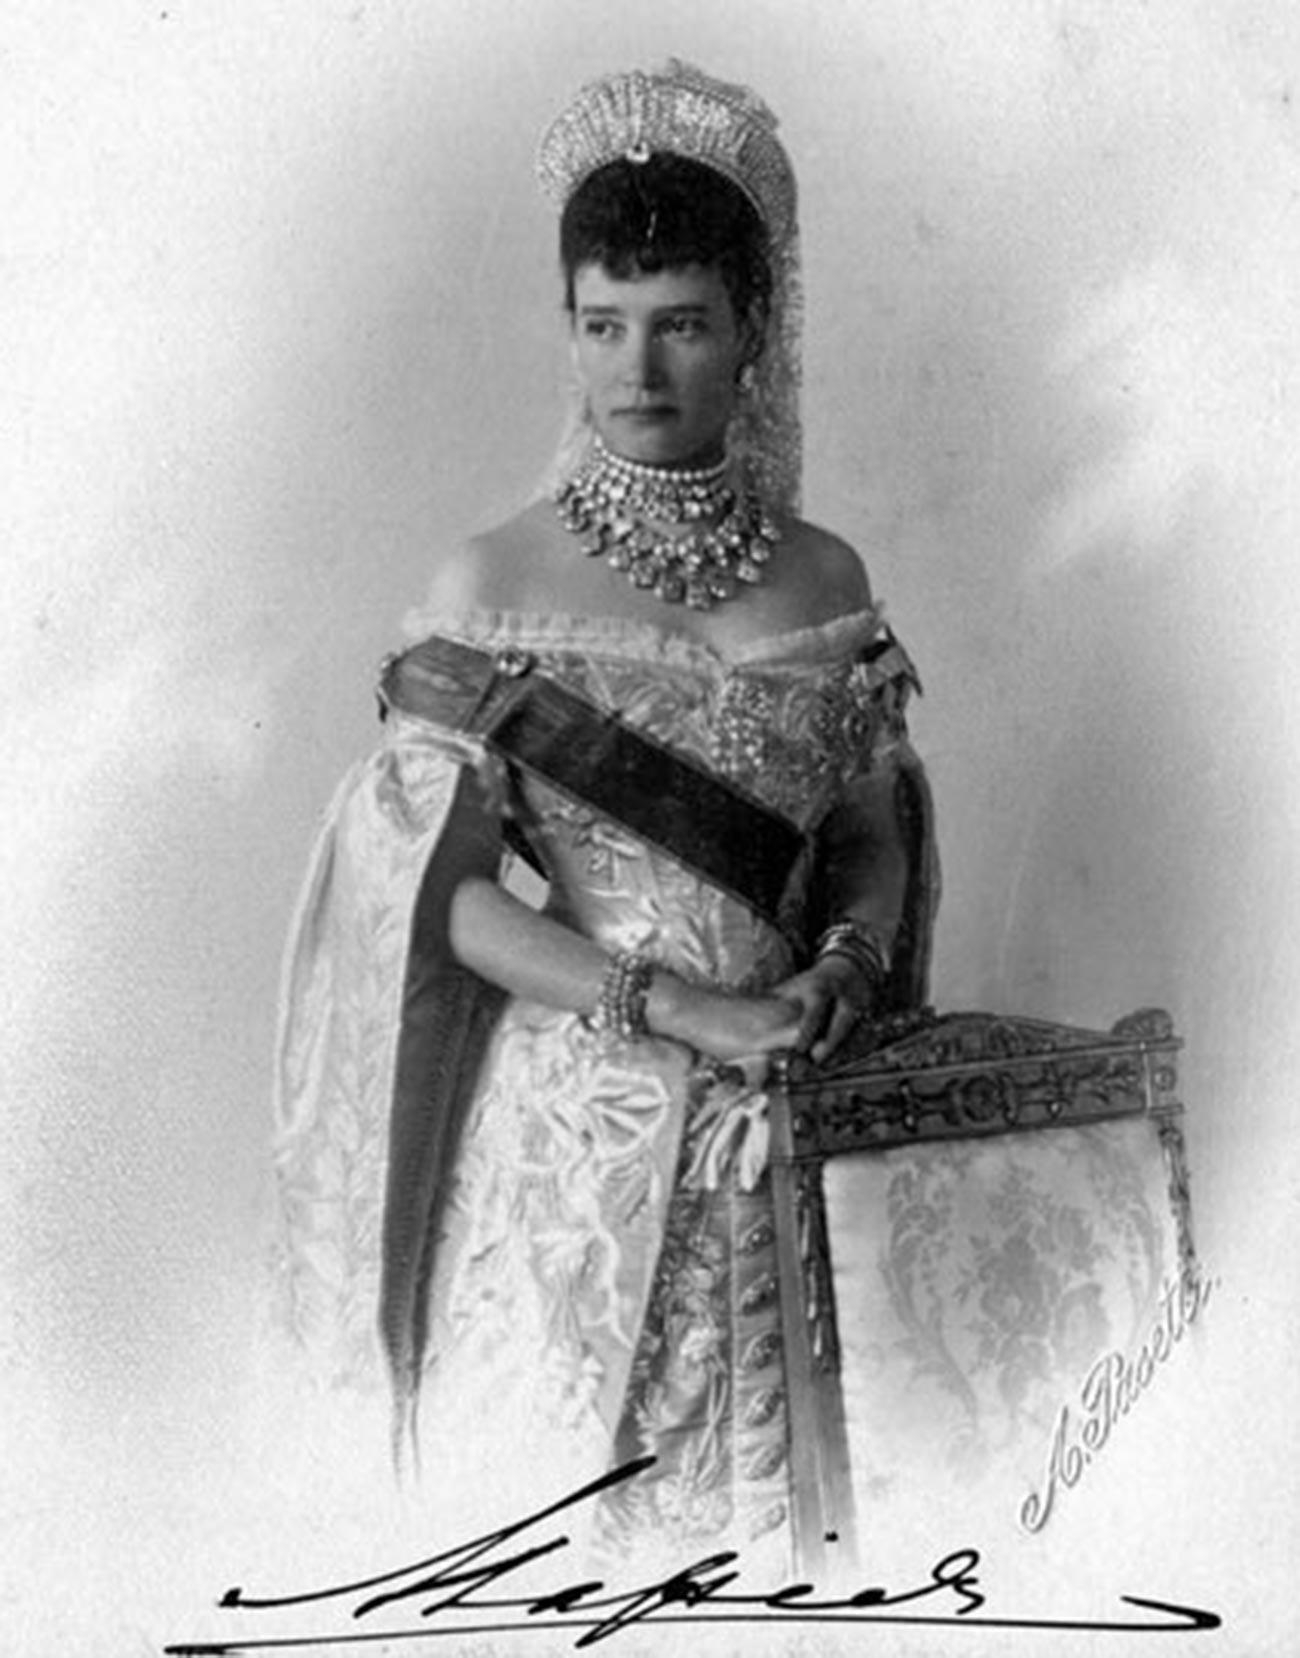 Kaiserin Maria Feodorowna (Dagmar von Dänemark, 1847-1928)